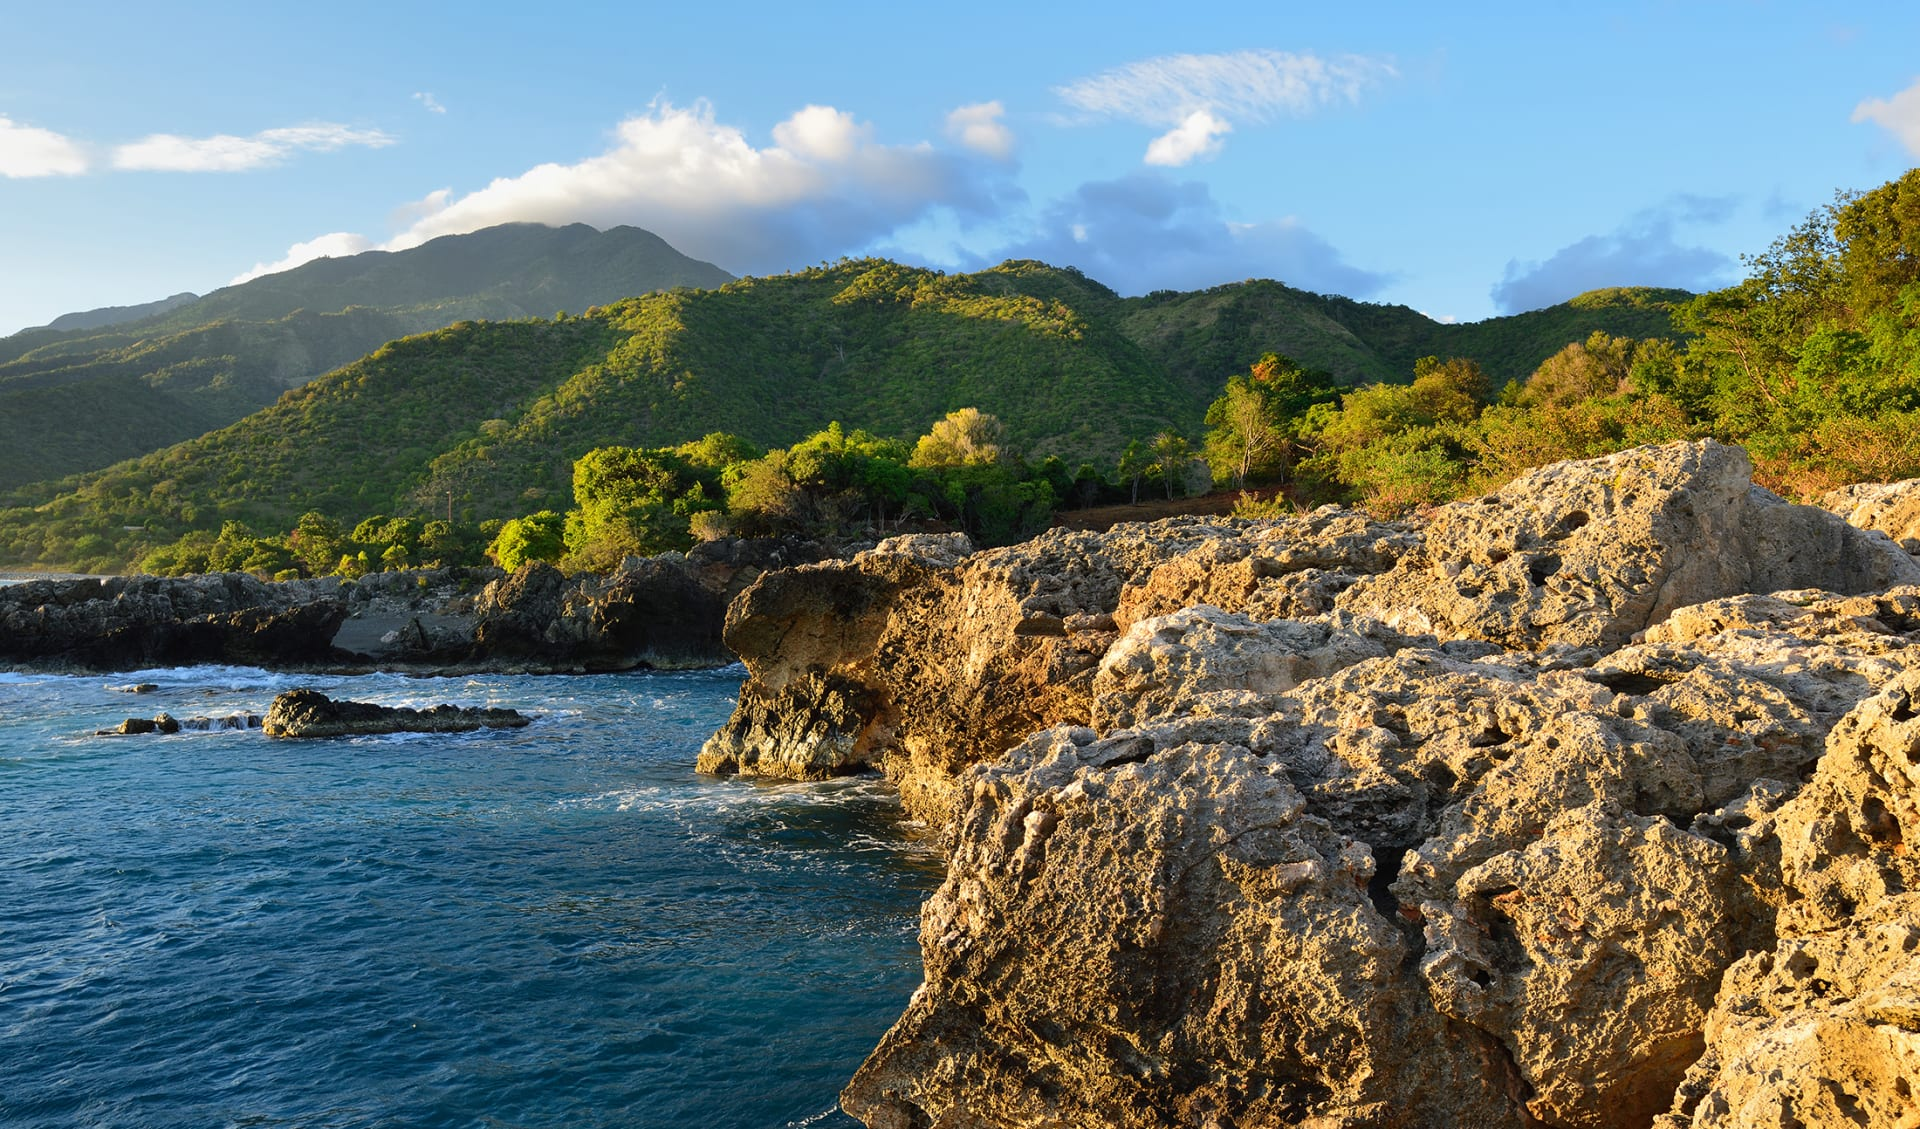 Cuban coast of mountains Sierra Maestra and above the coast of the Caribbean sea